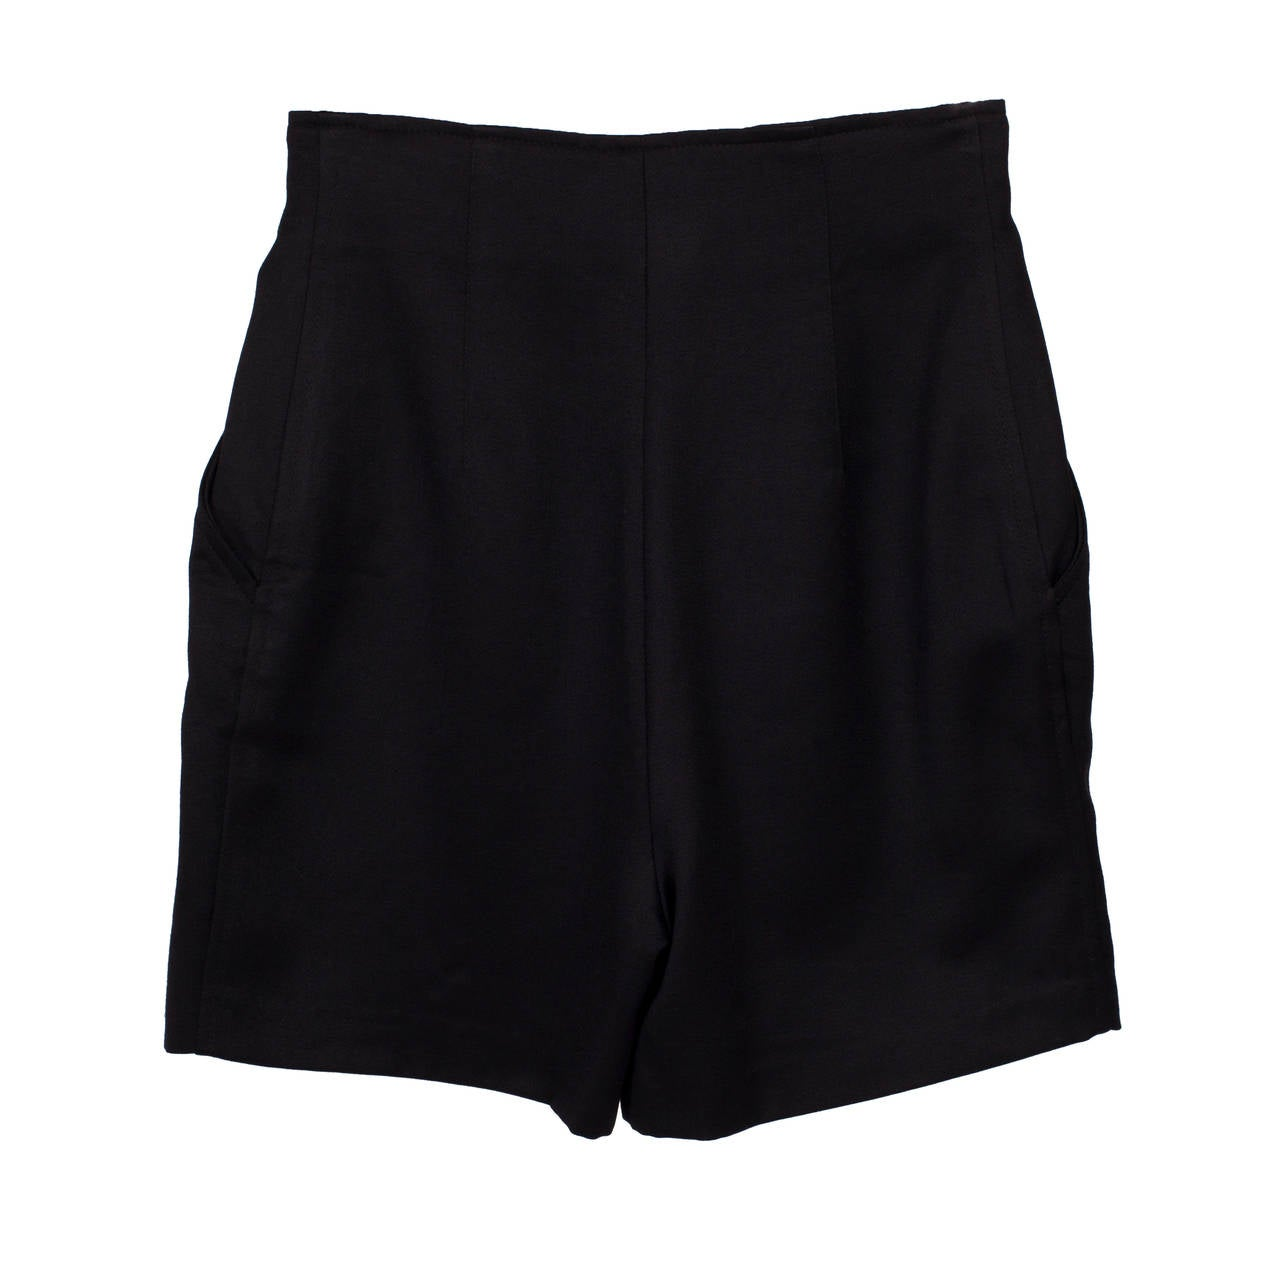 Women's Versus Gianni Versace Black Marine High Waisted Shorts For Sale